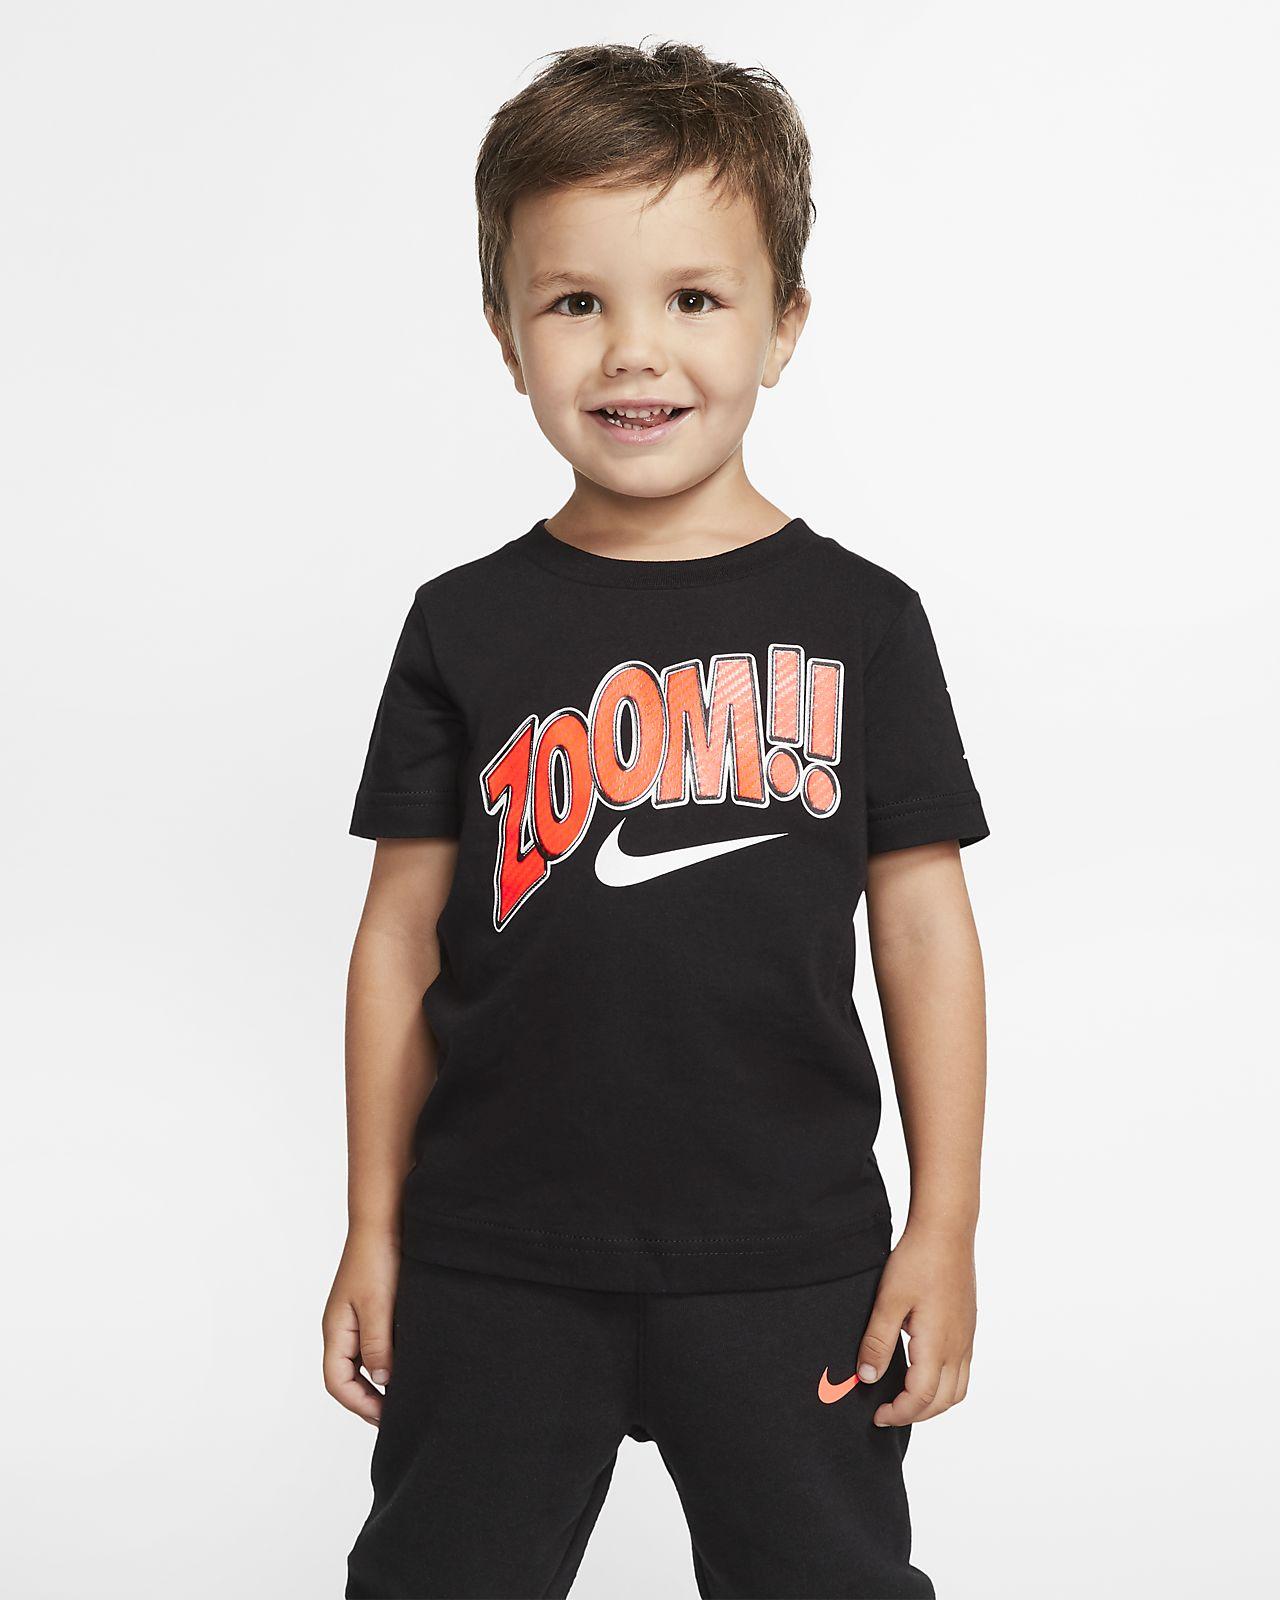 Kyrie Toddler T-Shirt